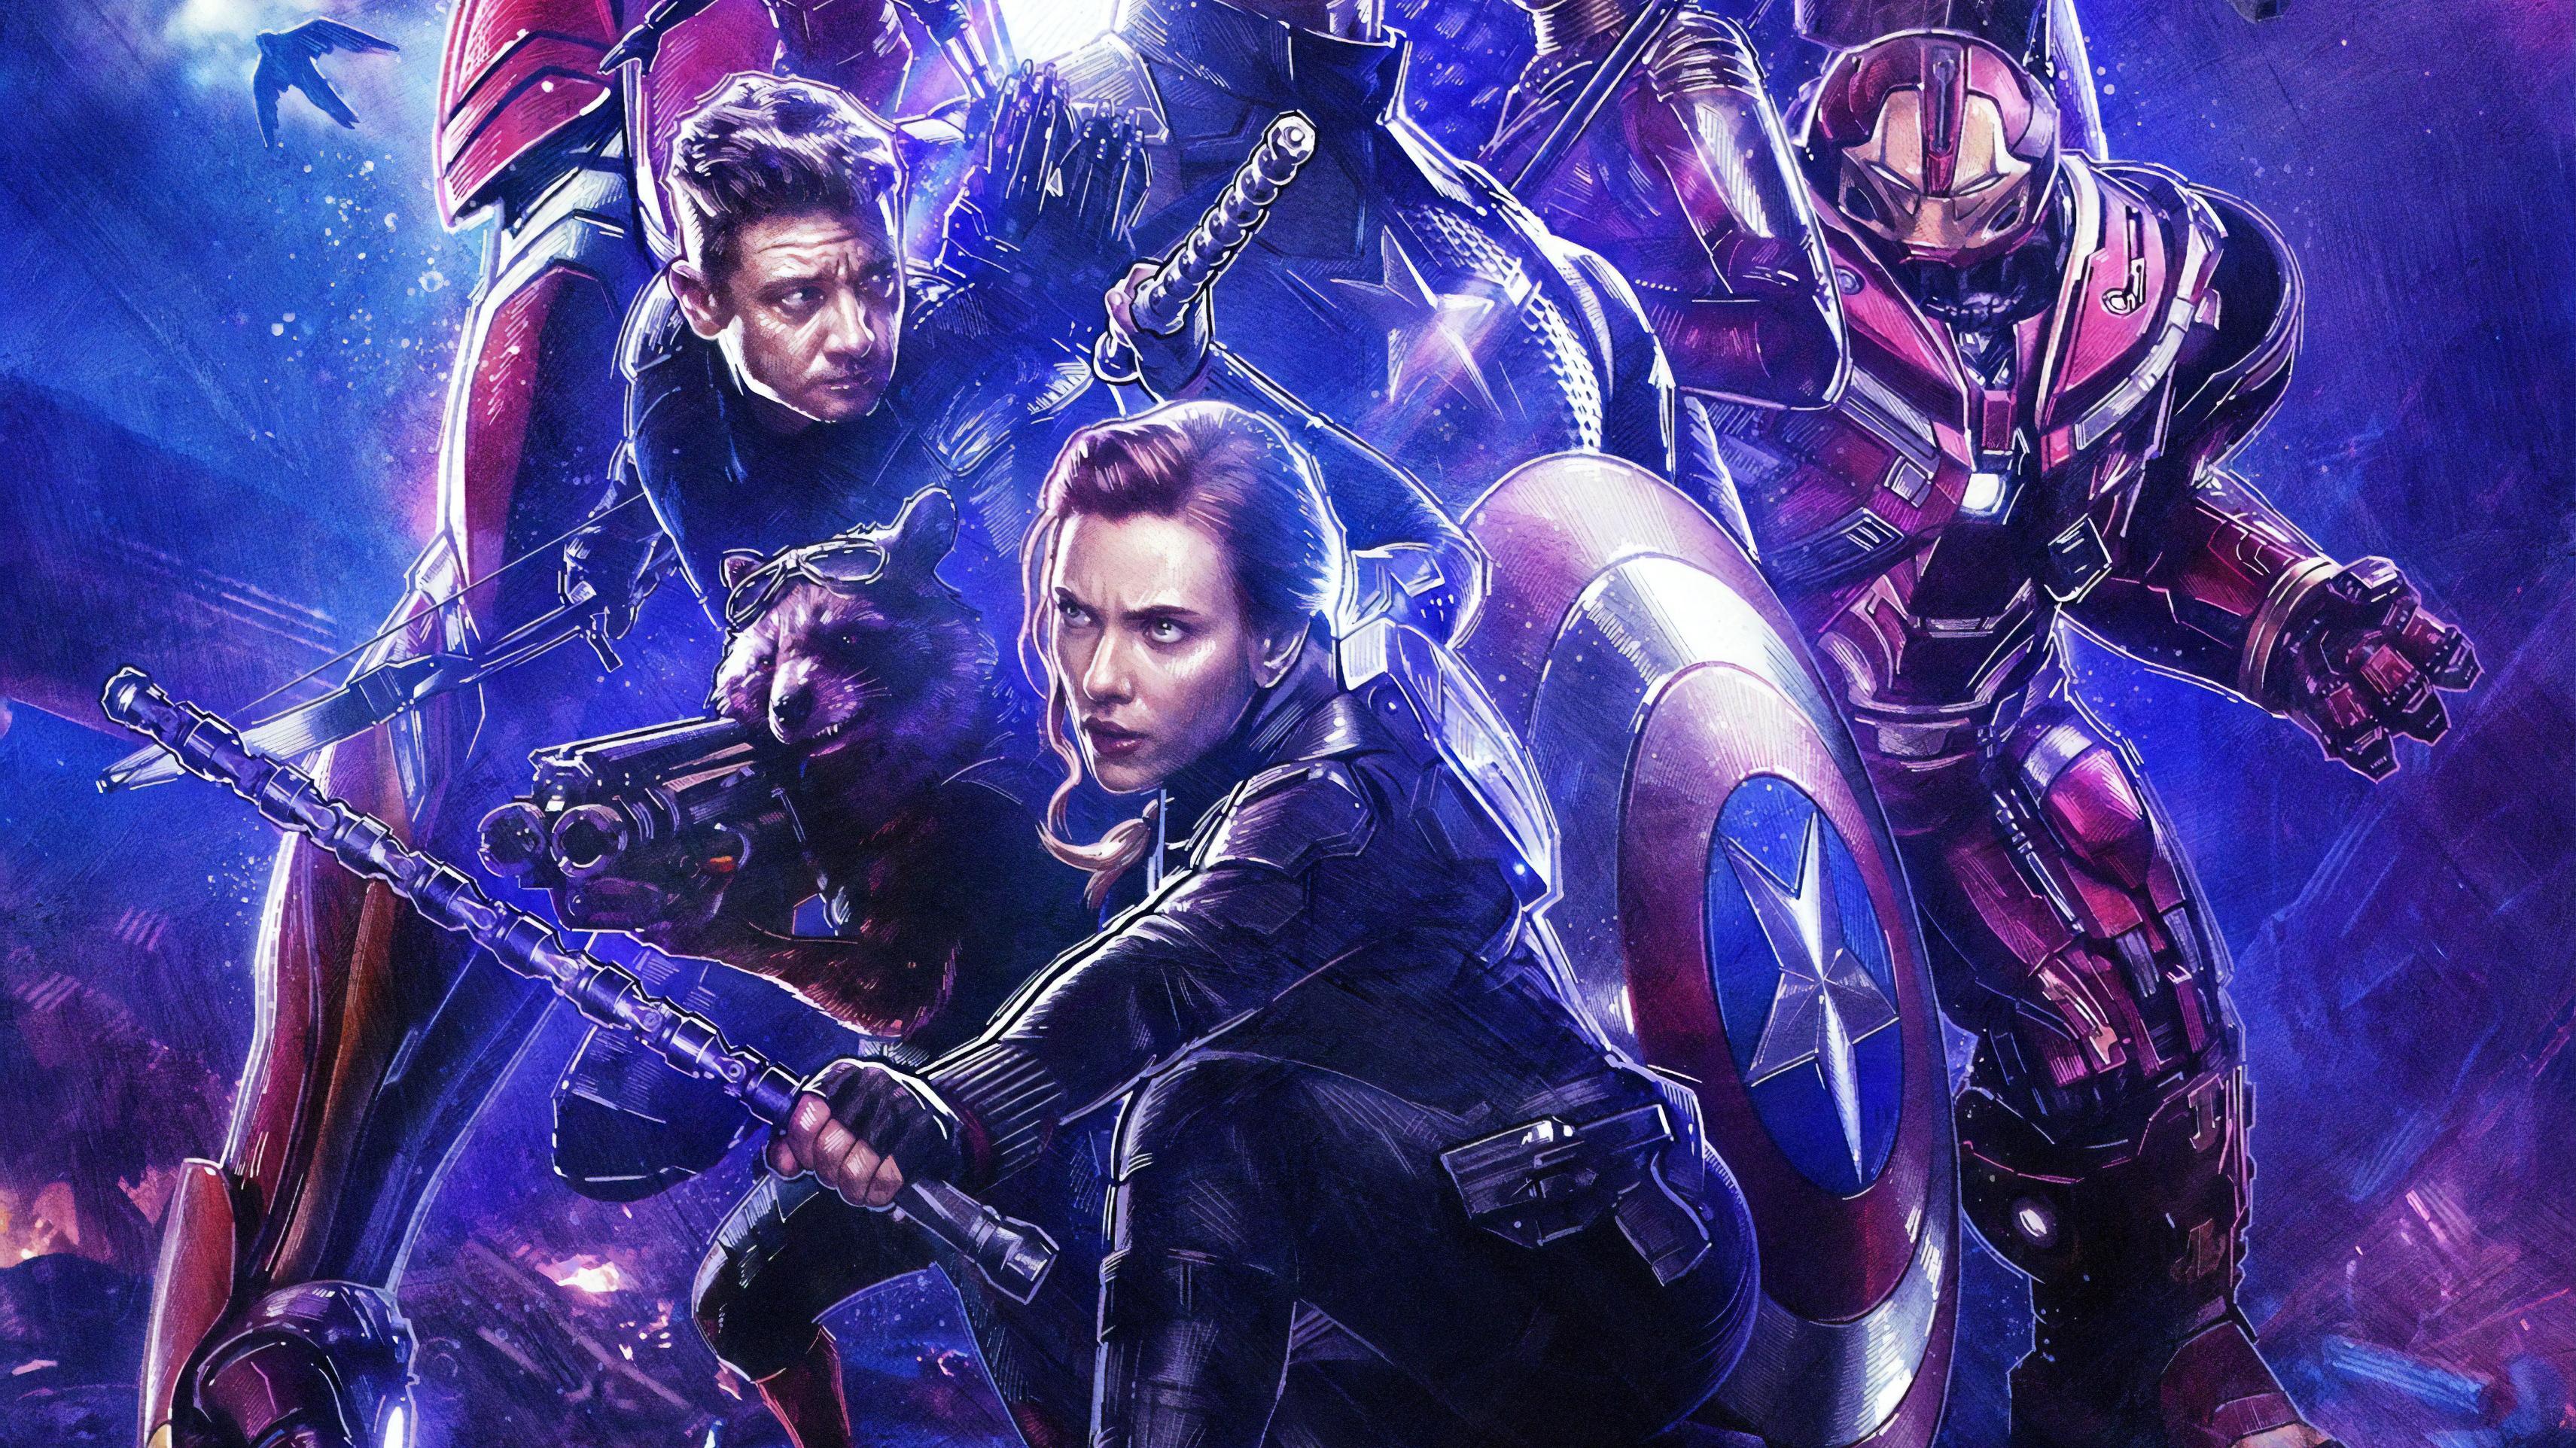 1125x2436 Avengers Endgame 4k Iphone XS,Iphone 10,Iphone X ...